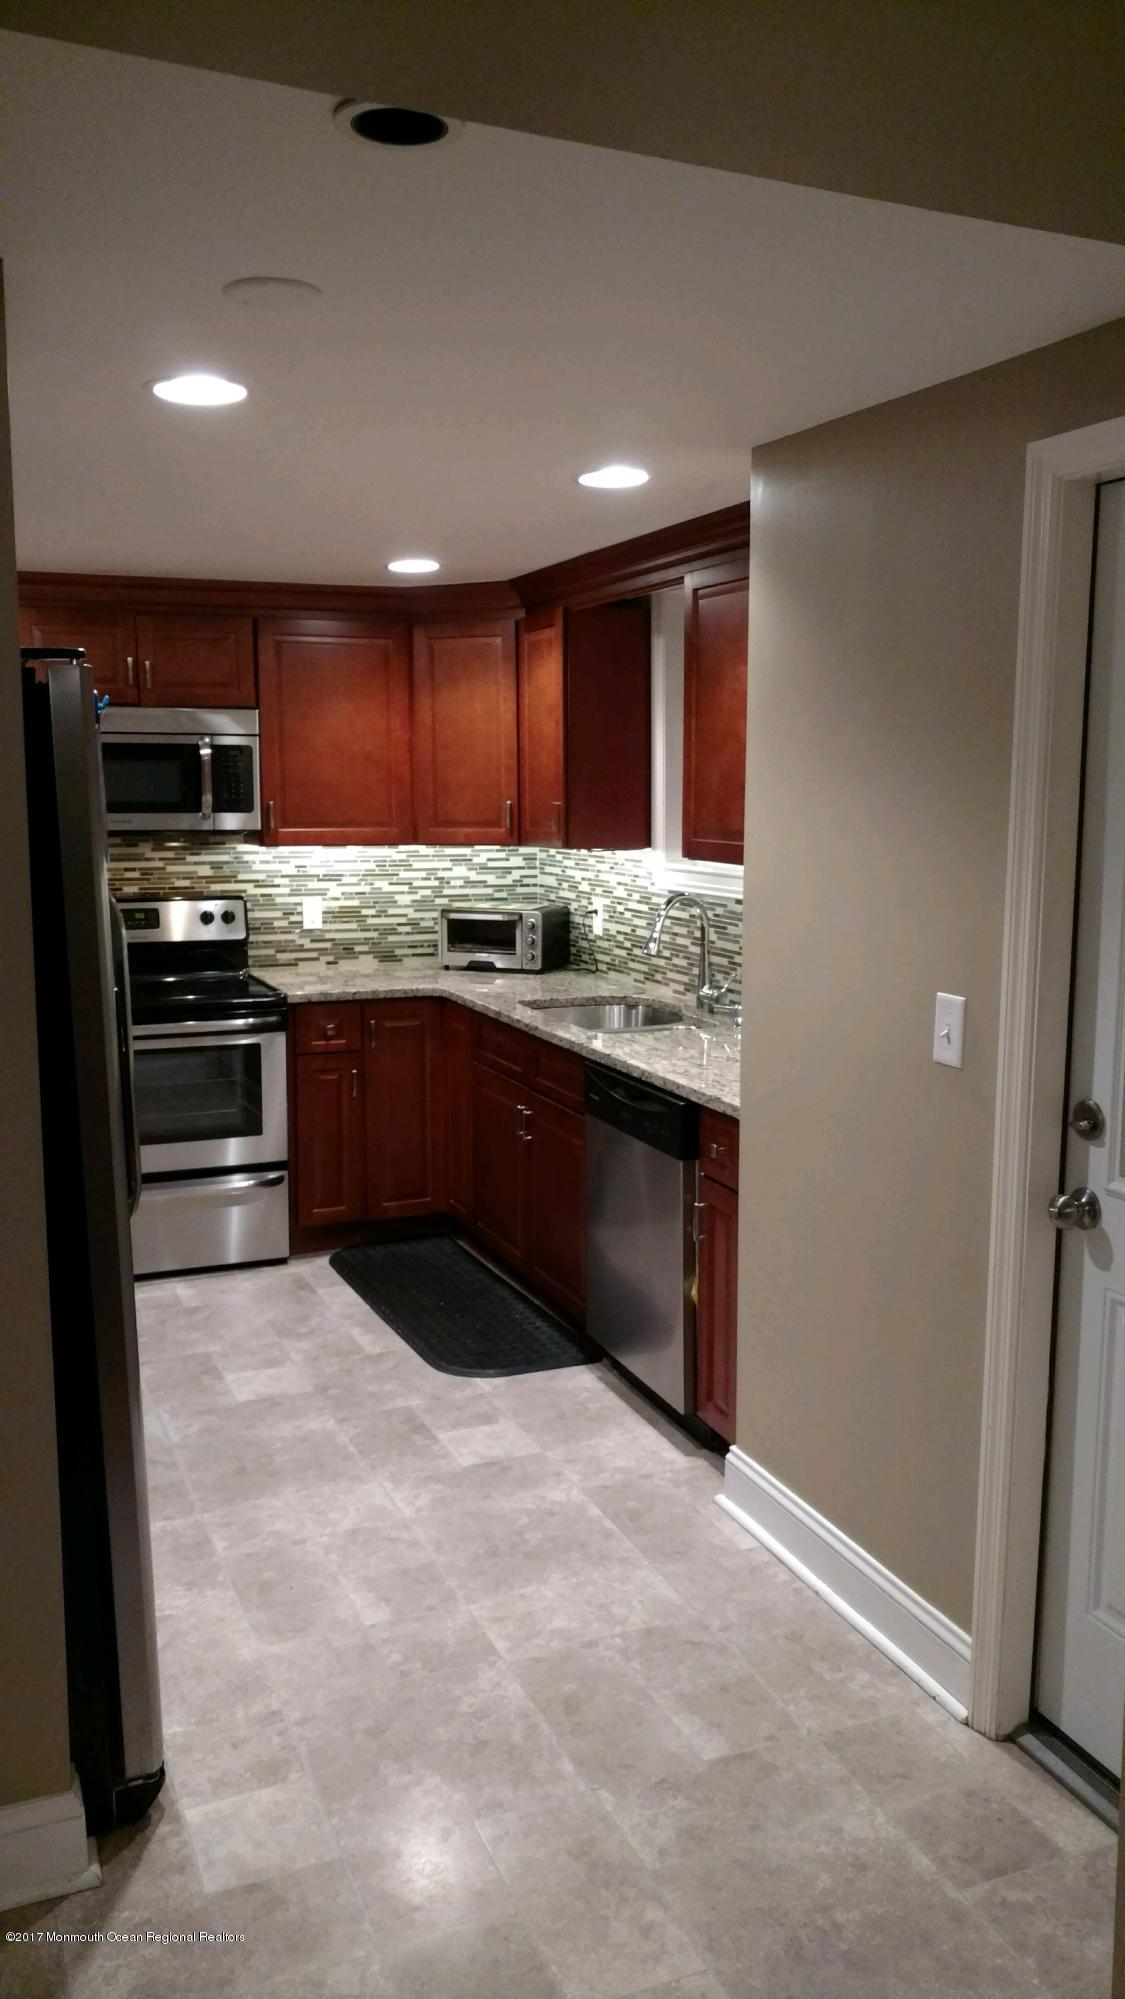 4 clinton Kitchen